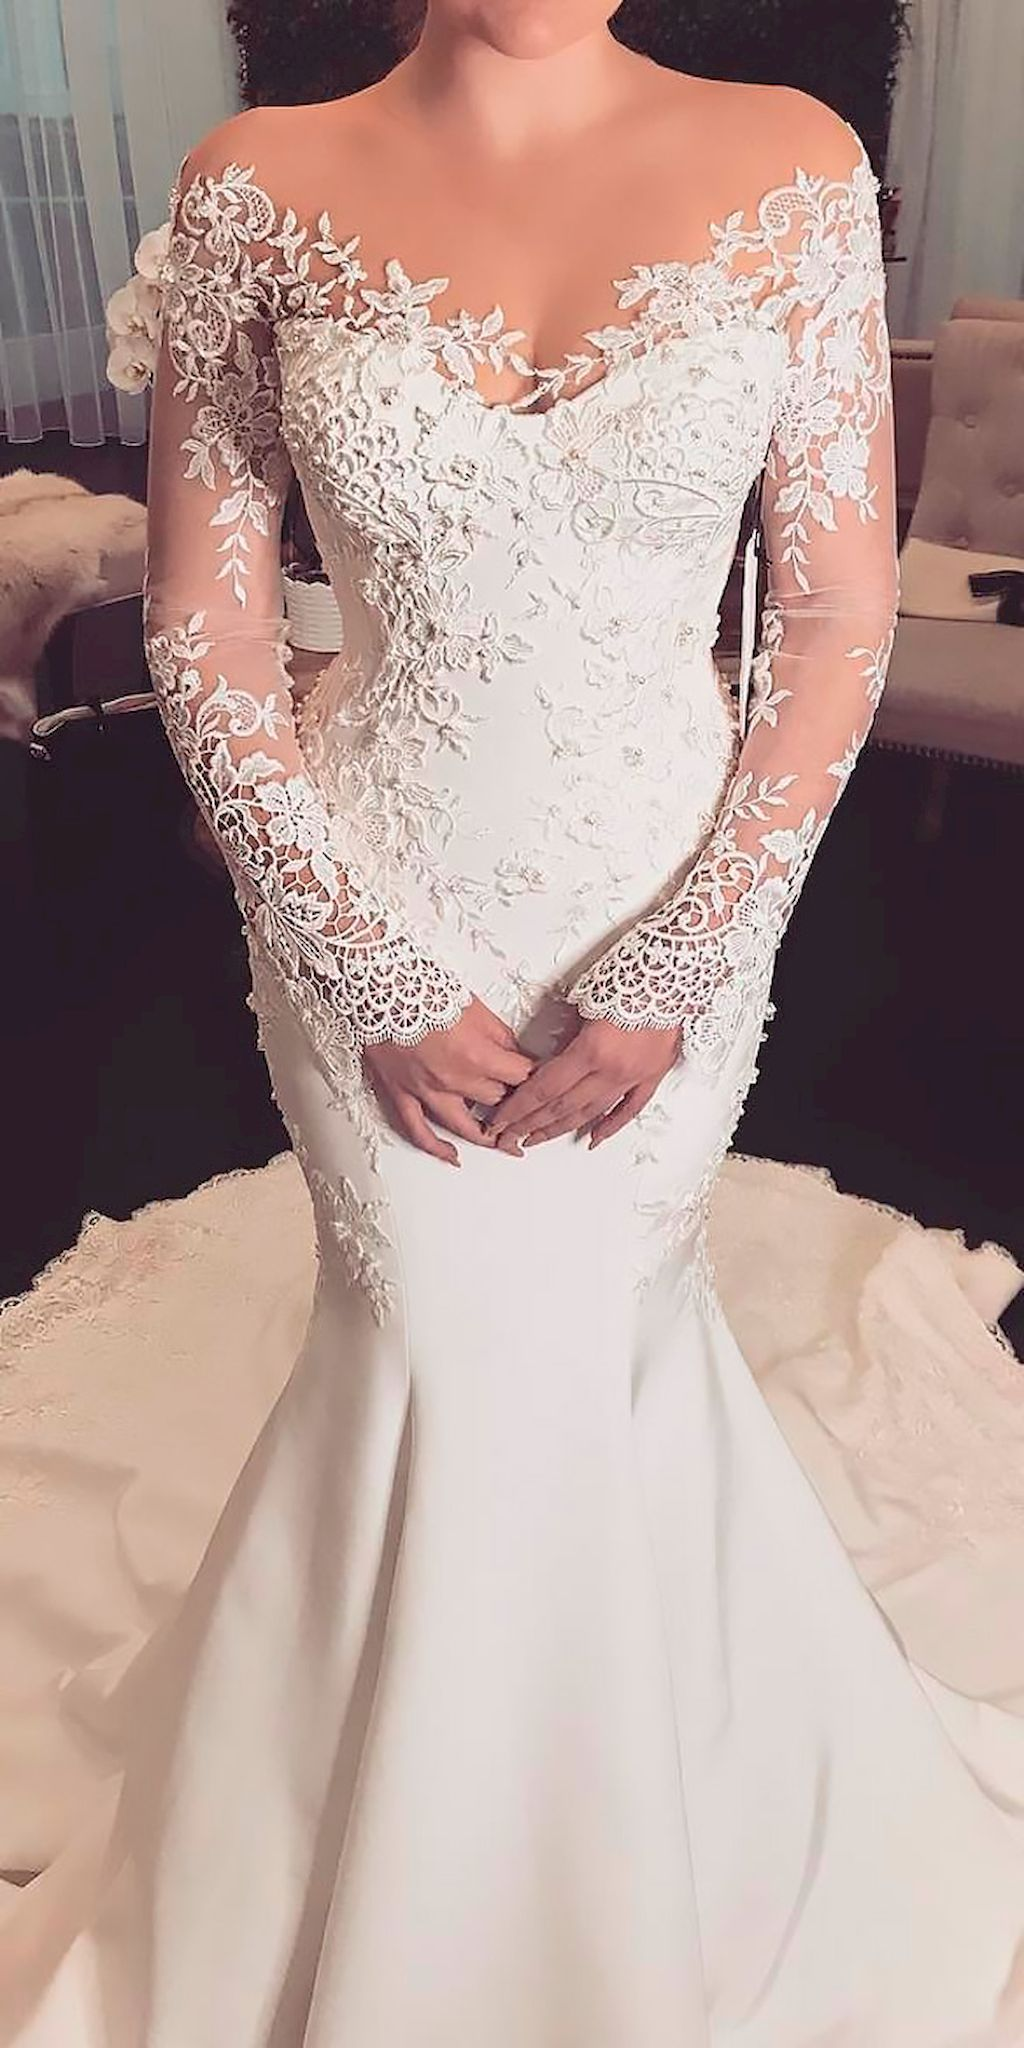 Awesome stunning long sleeve wedding dresses bitecloth